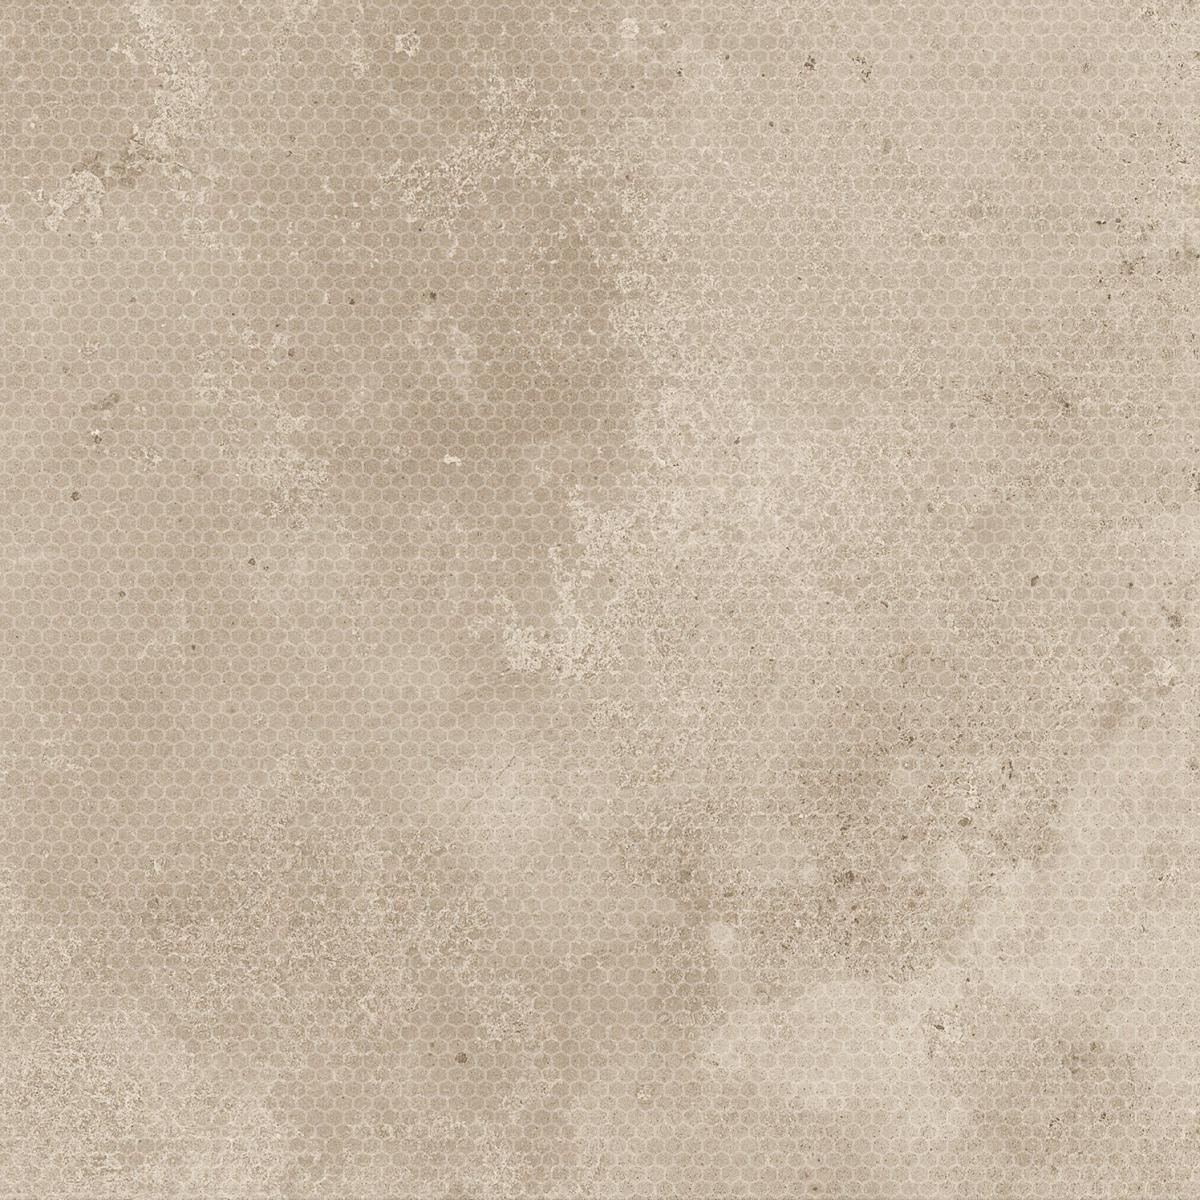 Vinci Blanco 25x25 Keros Cerámica